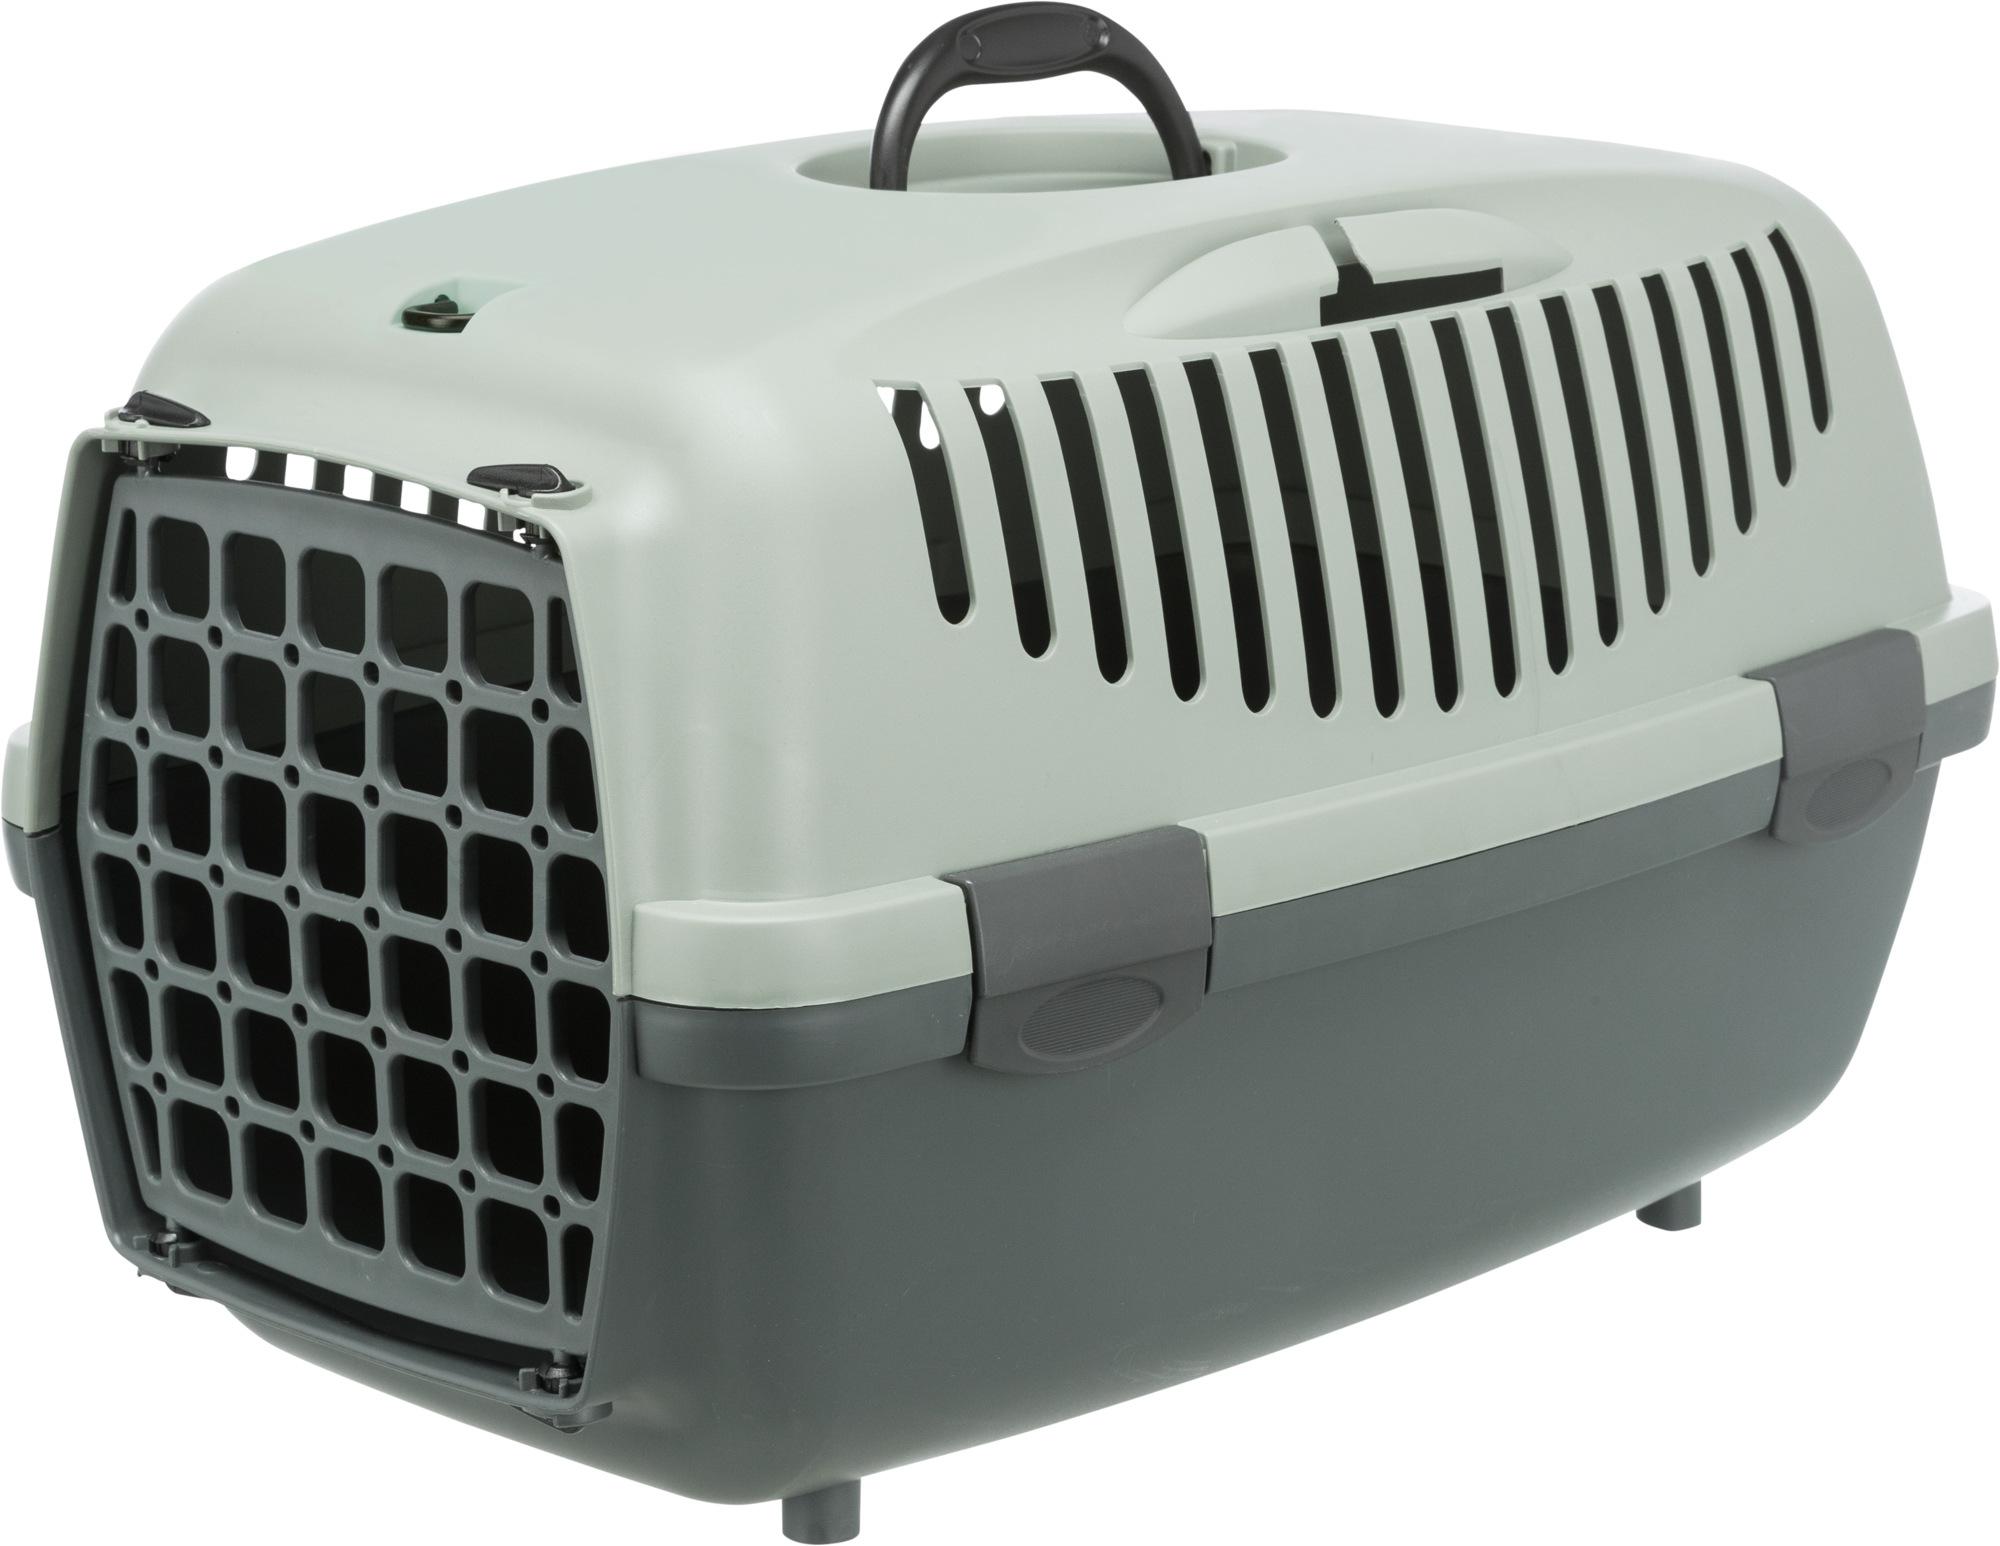 TRIXIE Be Eco Transportbox Capri 1, XS: 32 × 31 × 48 cm, anthrazit/grau-grün